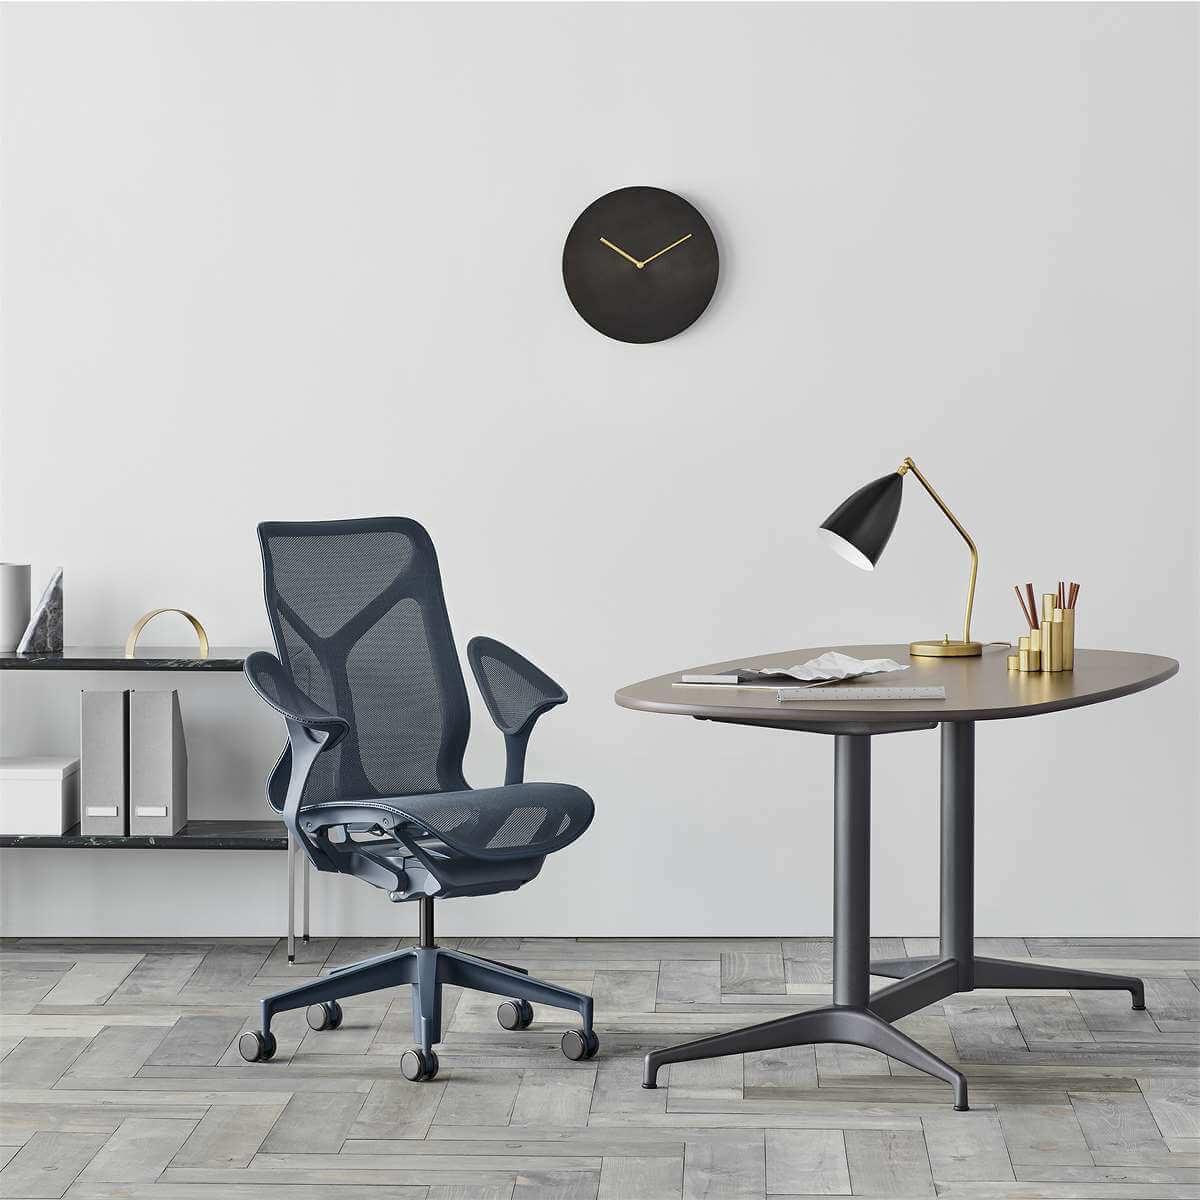 Ergonomic Office Chair - Cosm 3